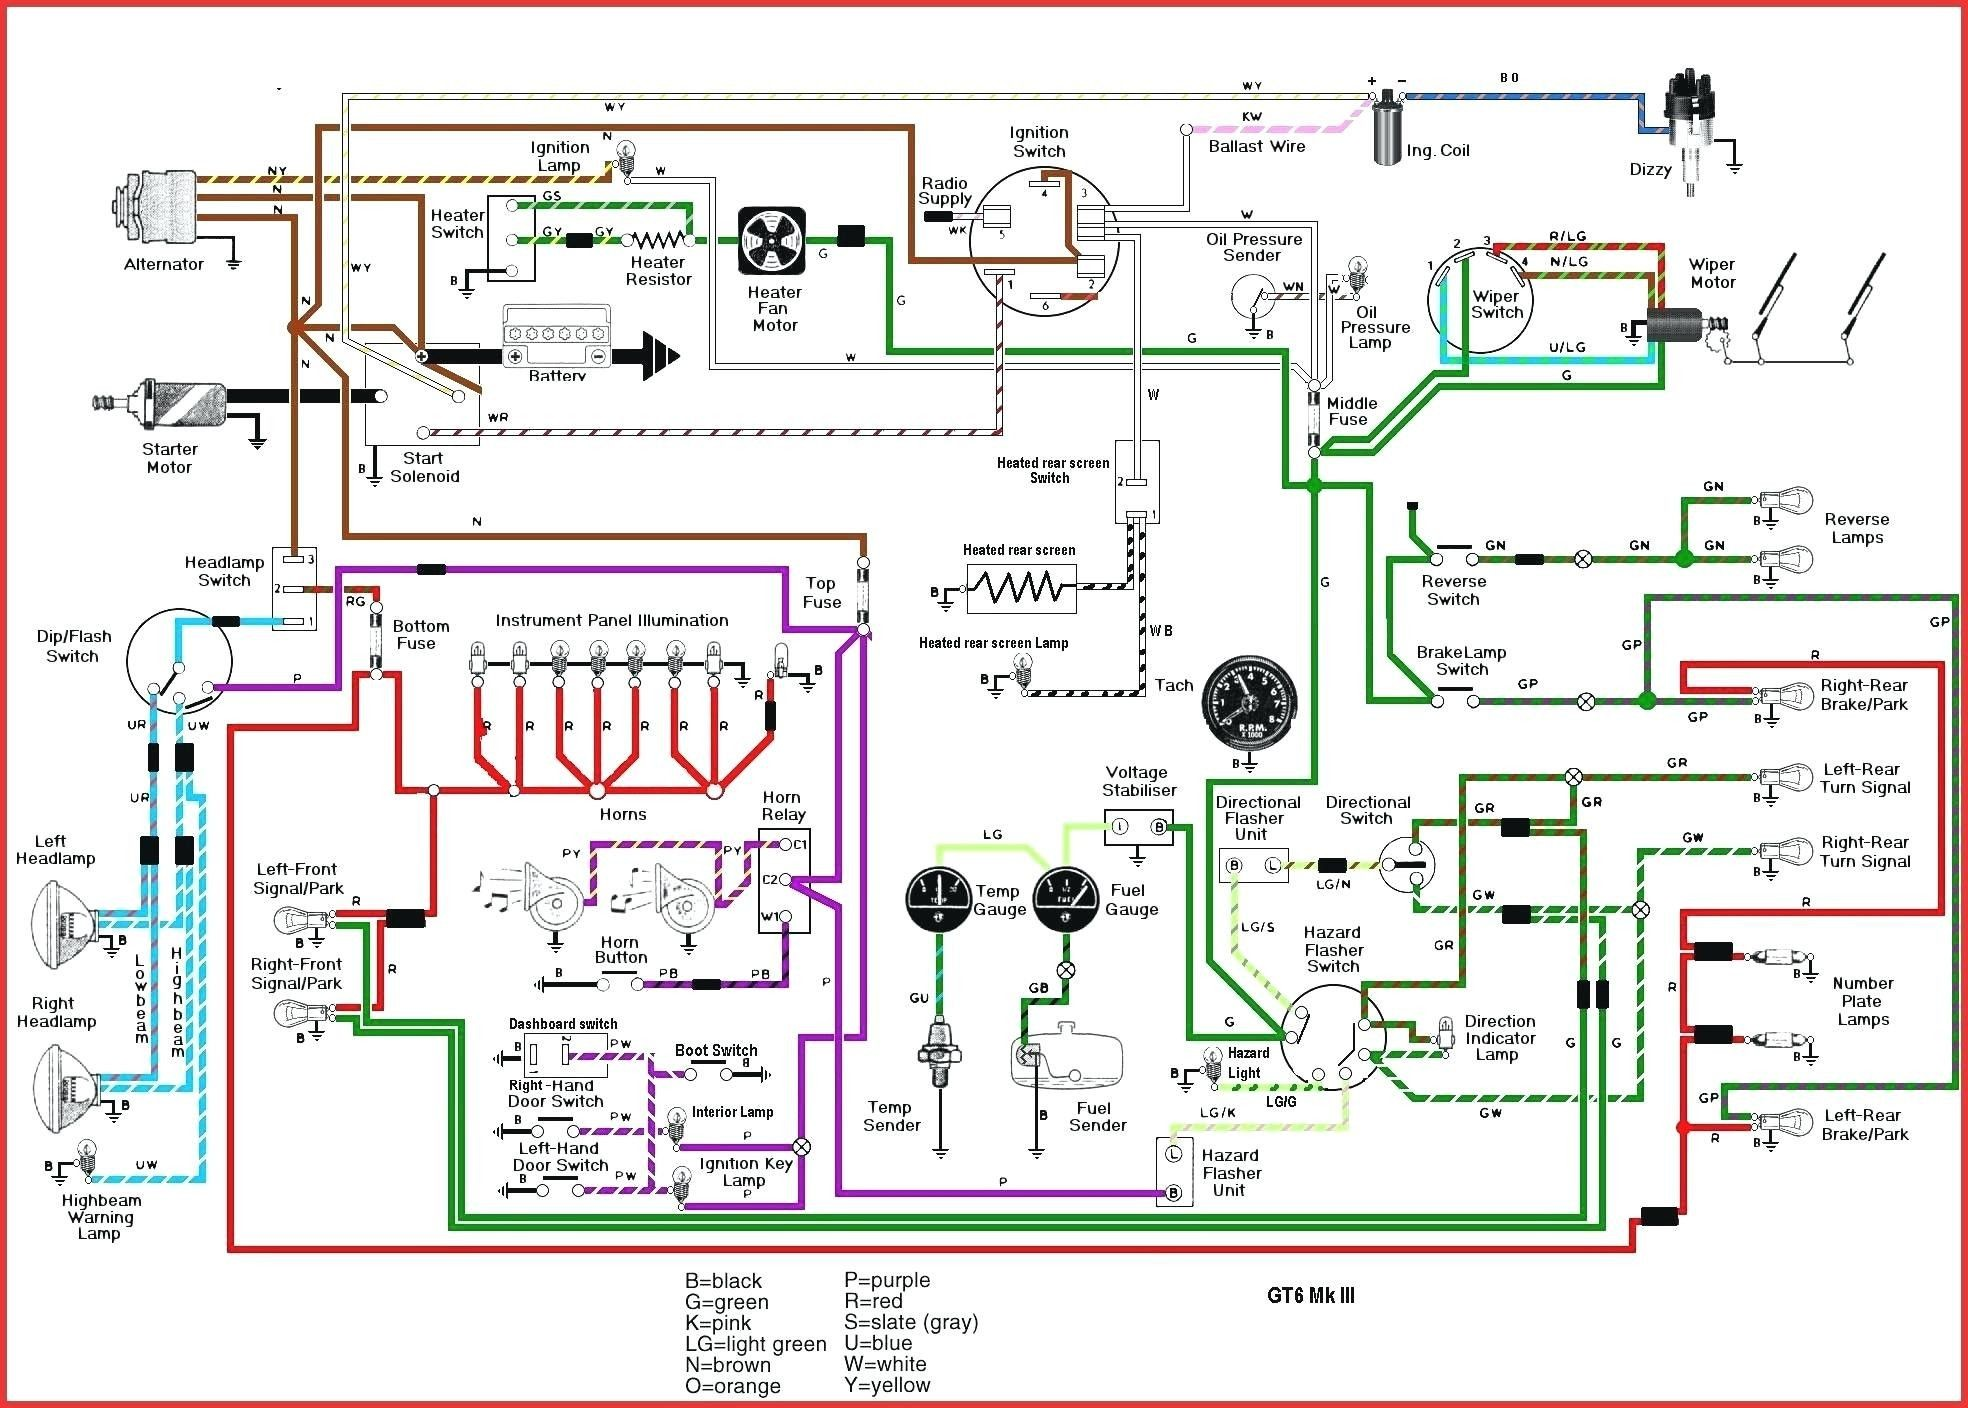 Electronic Choke Wiring Diagram 16 Automatic Mon Wiring Diagrams Design с изображениями Of Electronic Choke Wiring Diagram